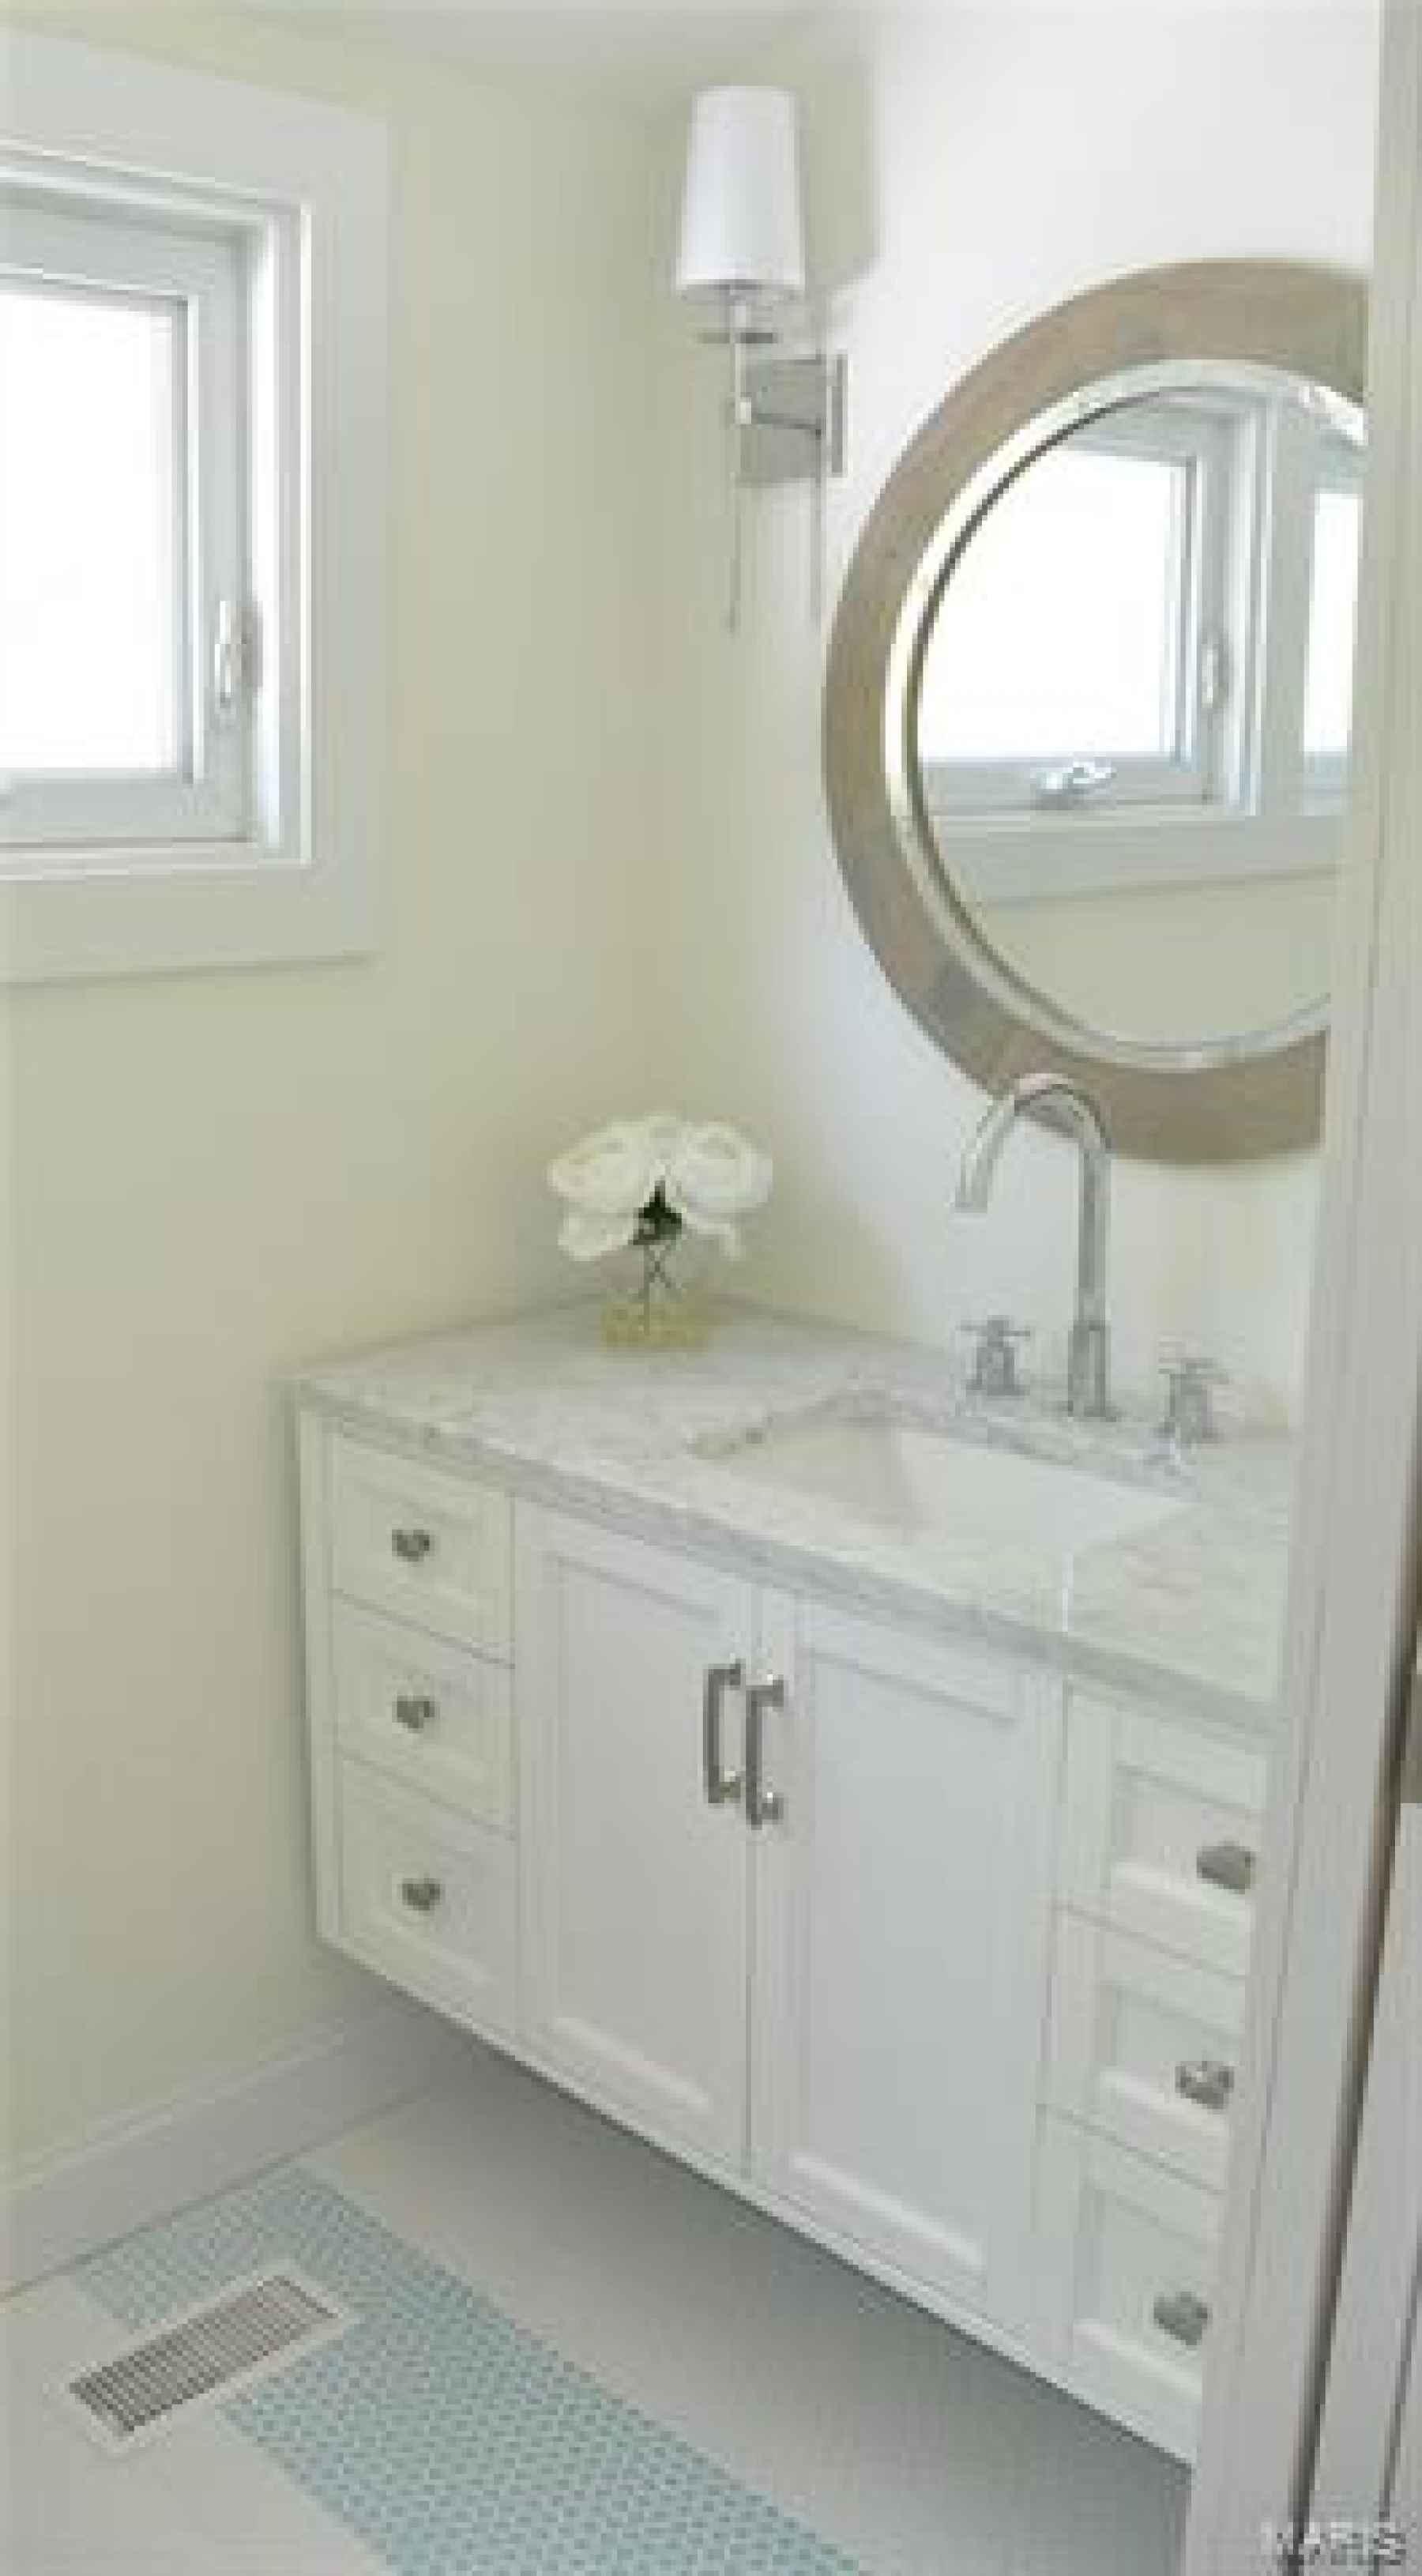 Second floor new bath with marble vanity